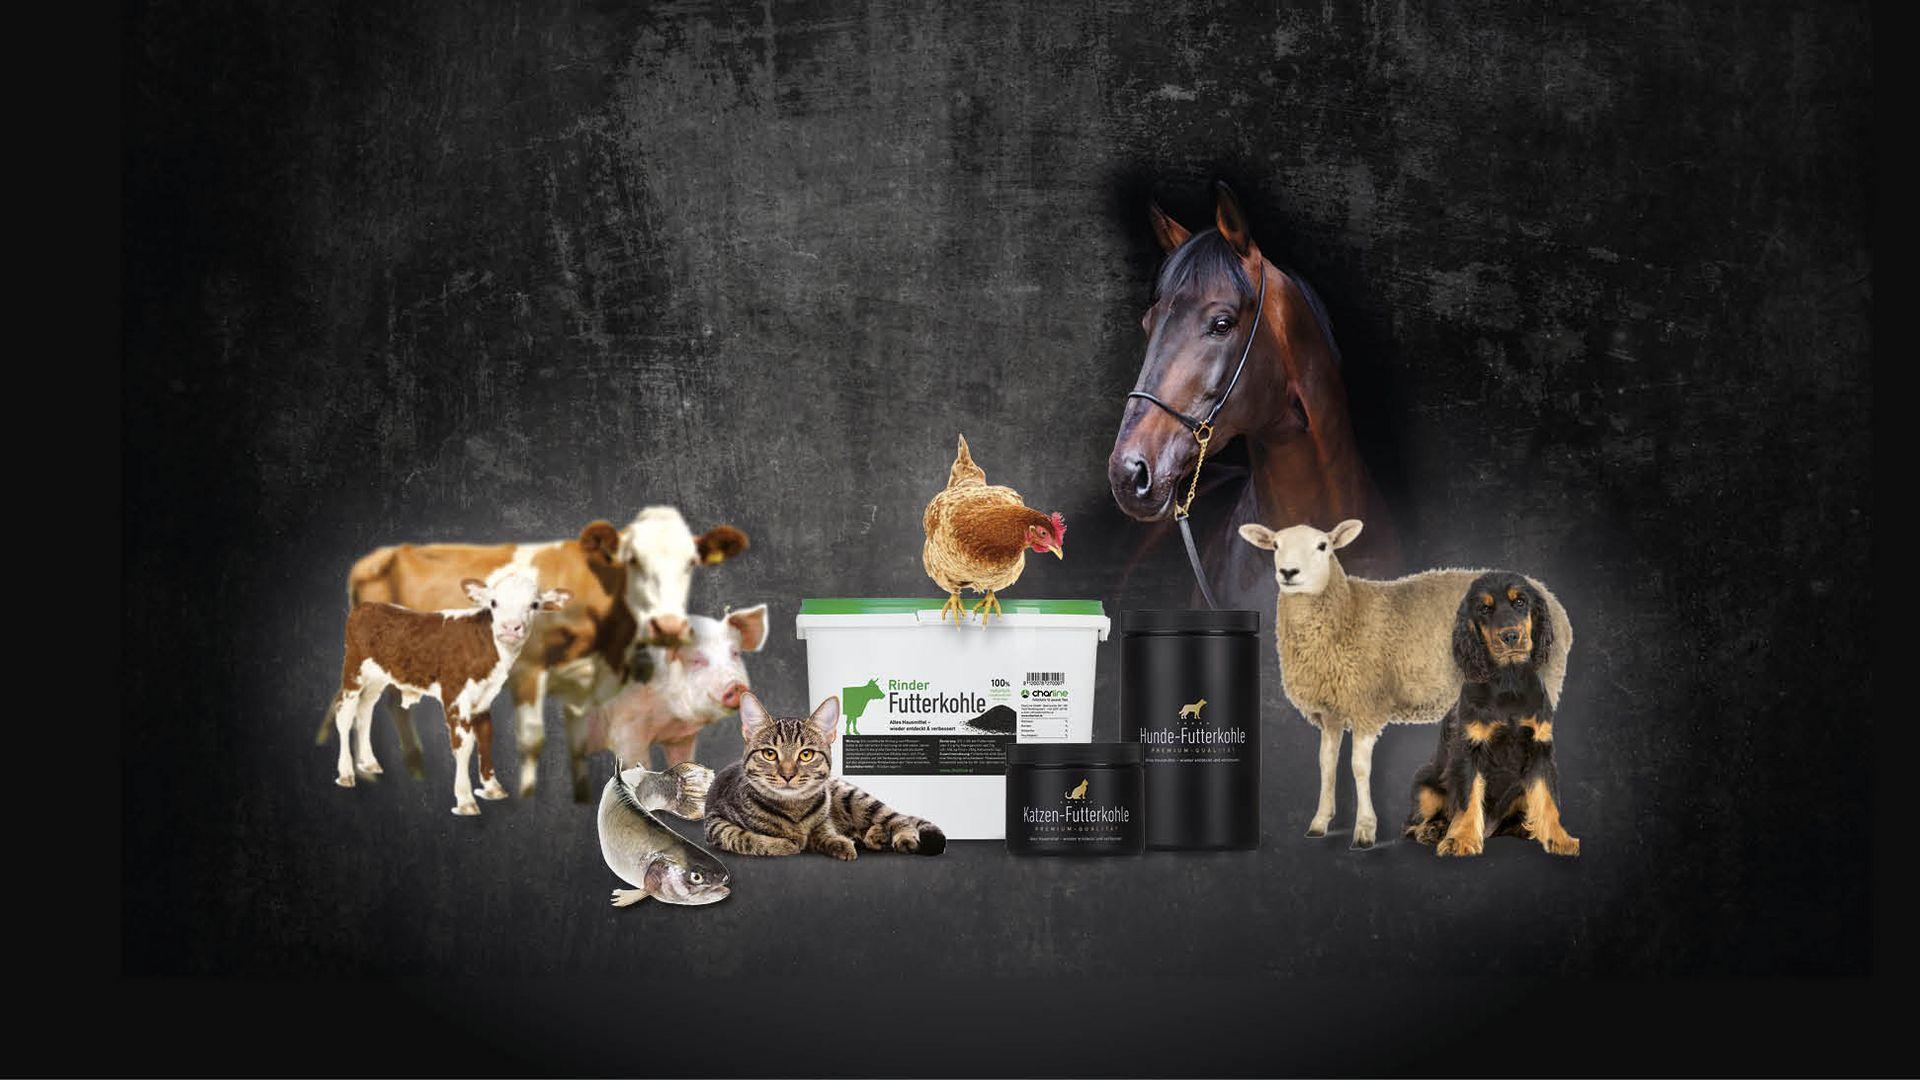 Futterkohle | CharLine GmbH